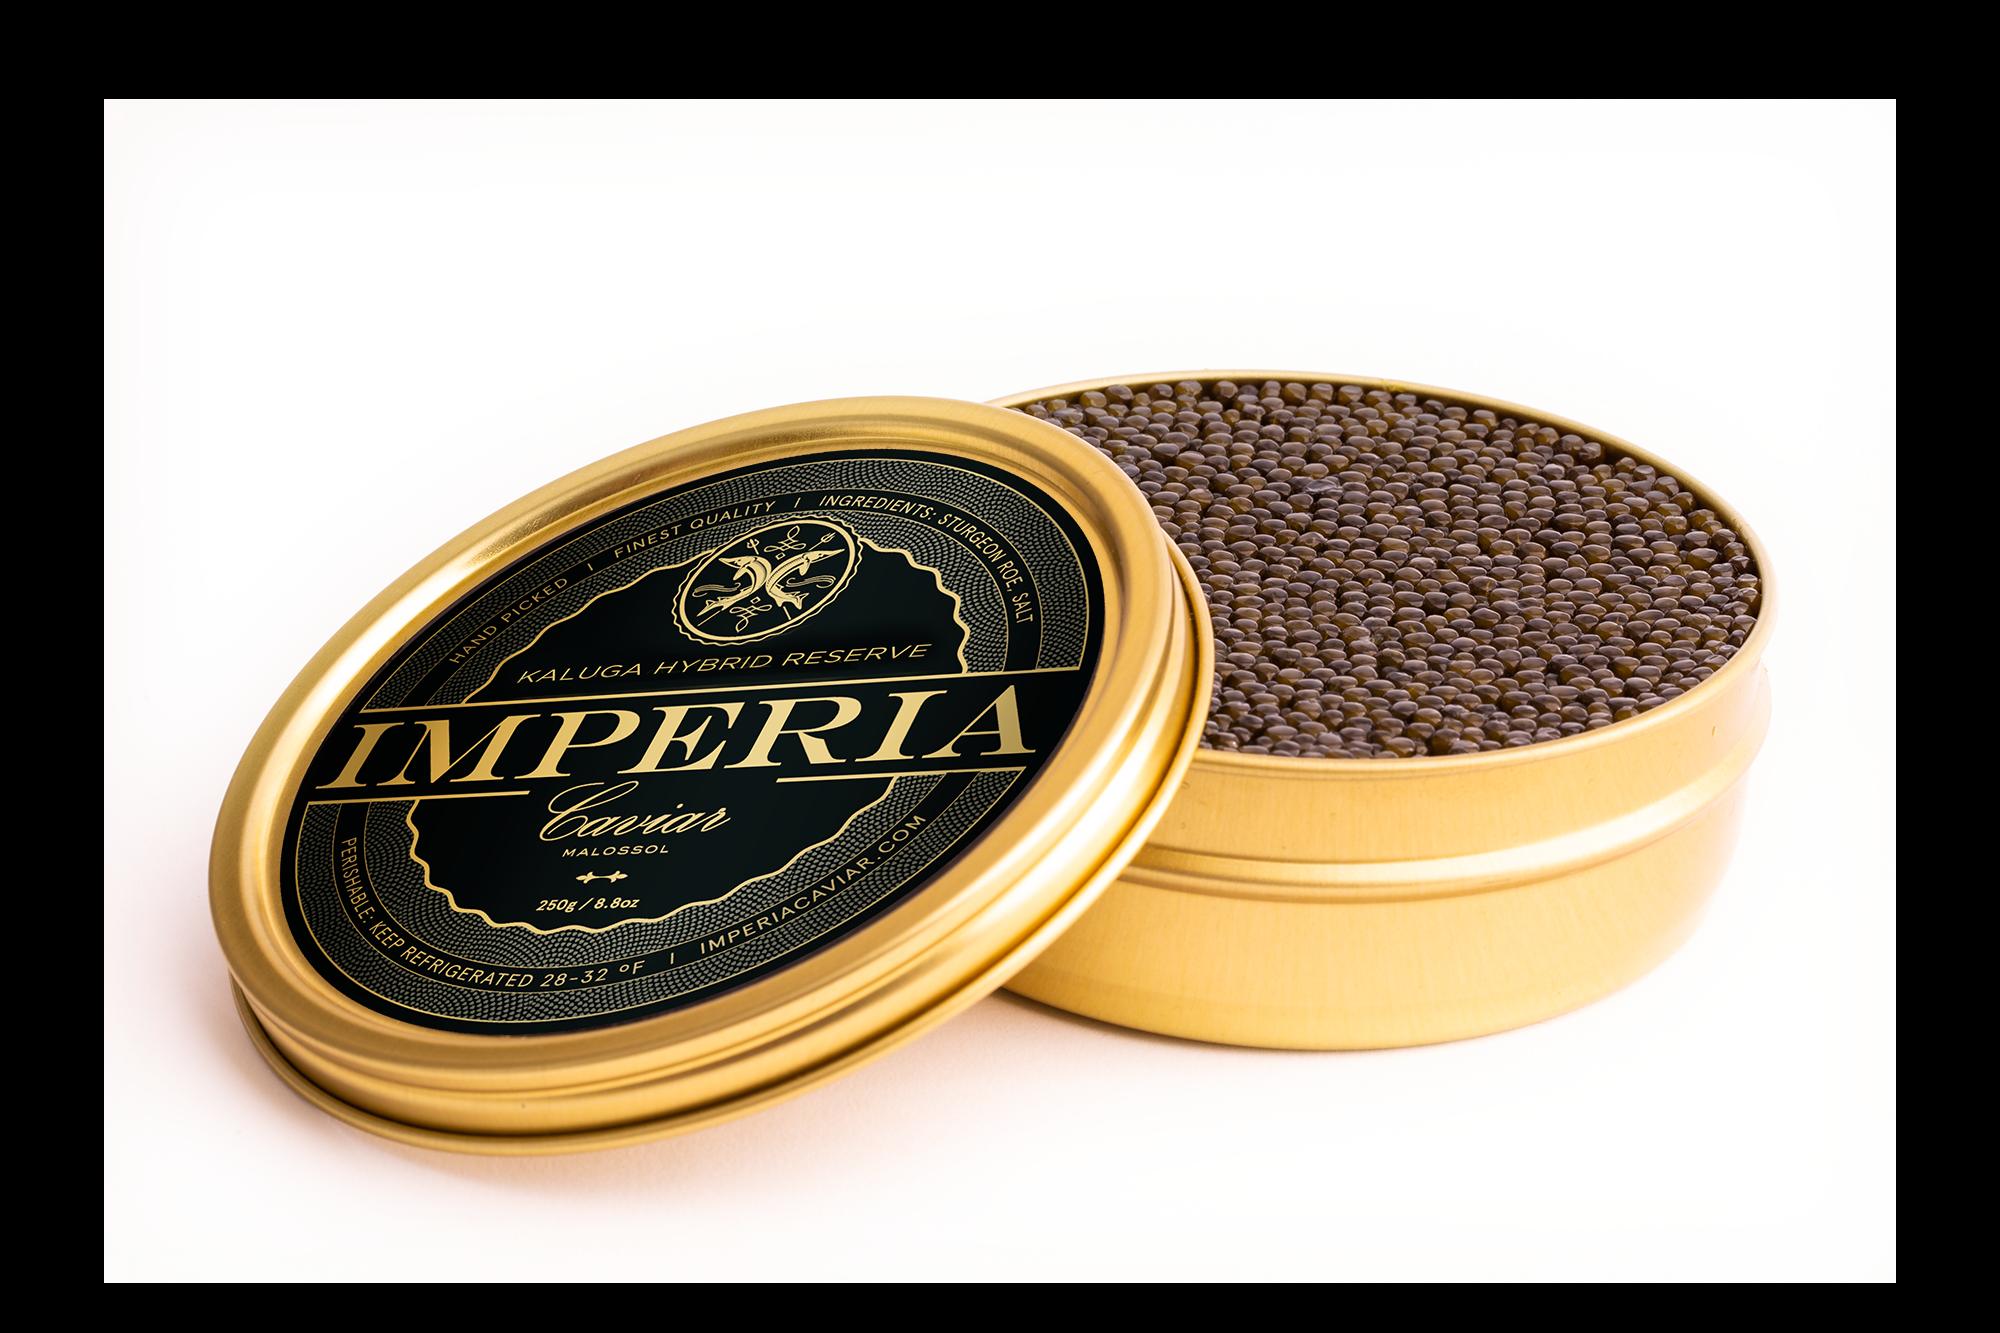 Imperia Caviar Tin